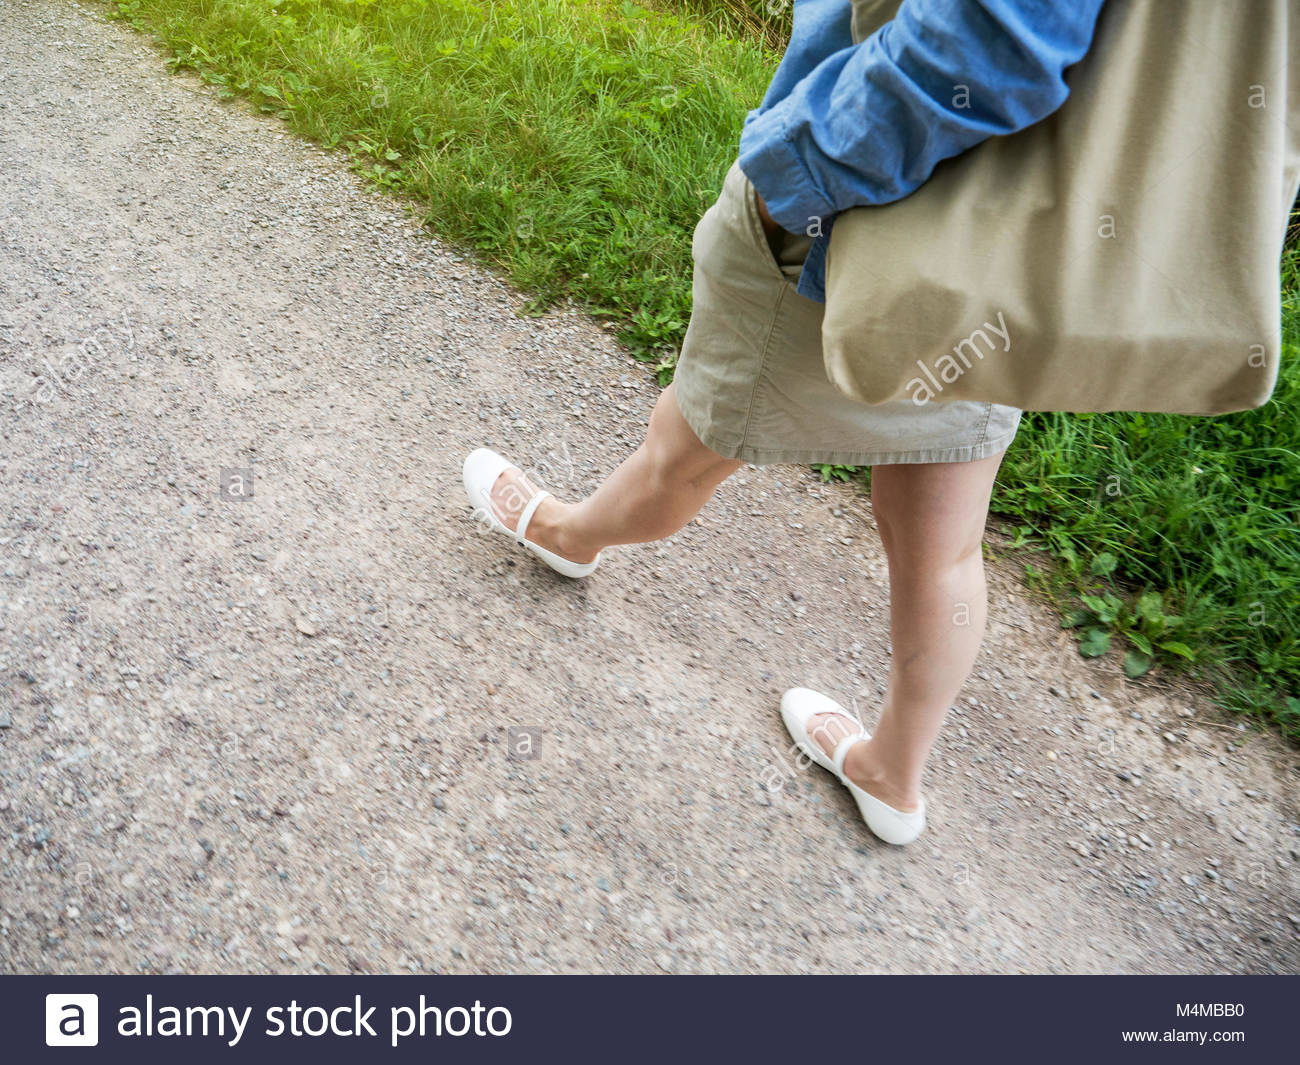 Woman walking carefree on rural path - Stock Image